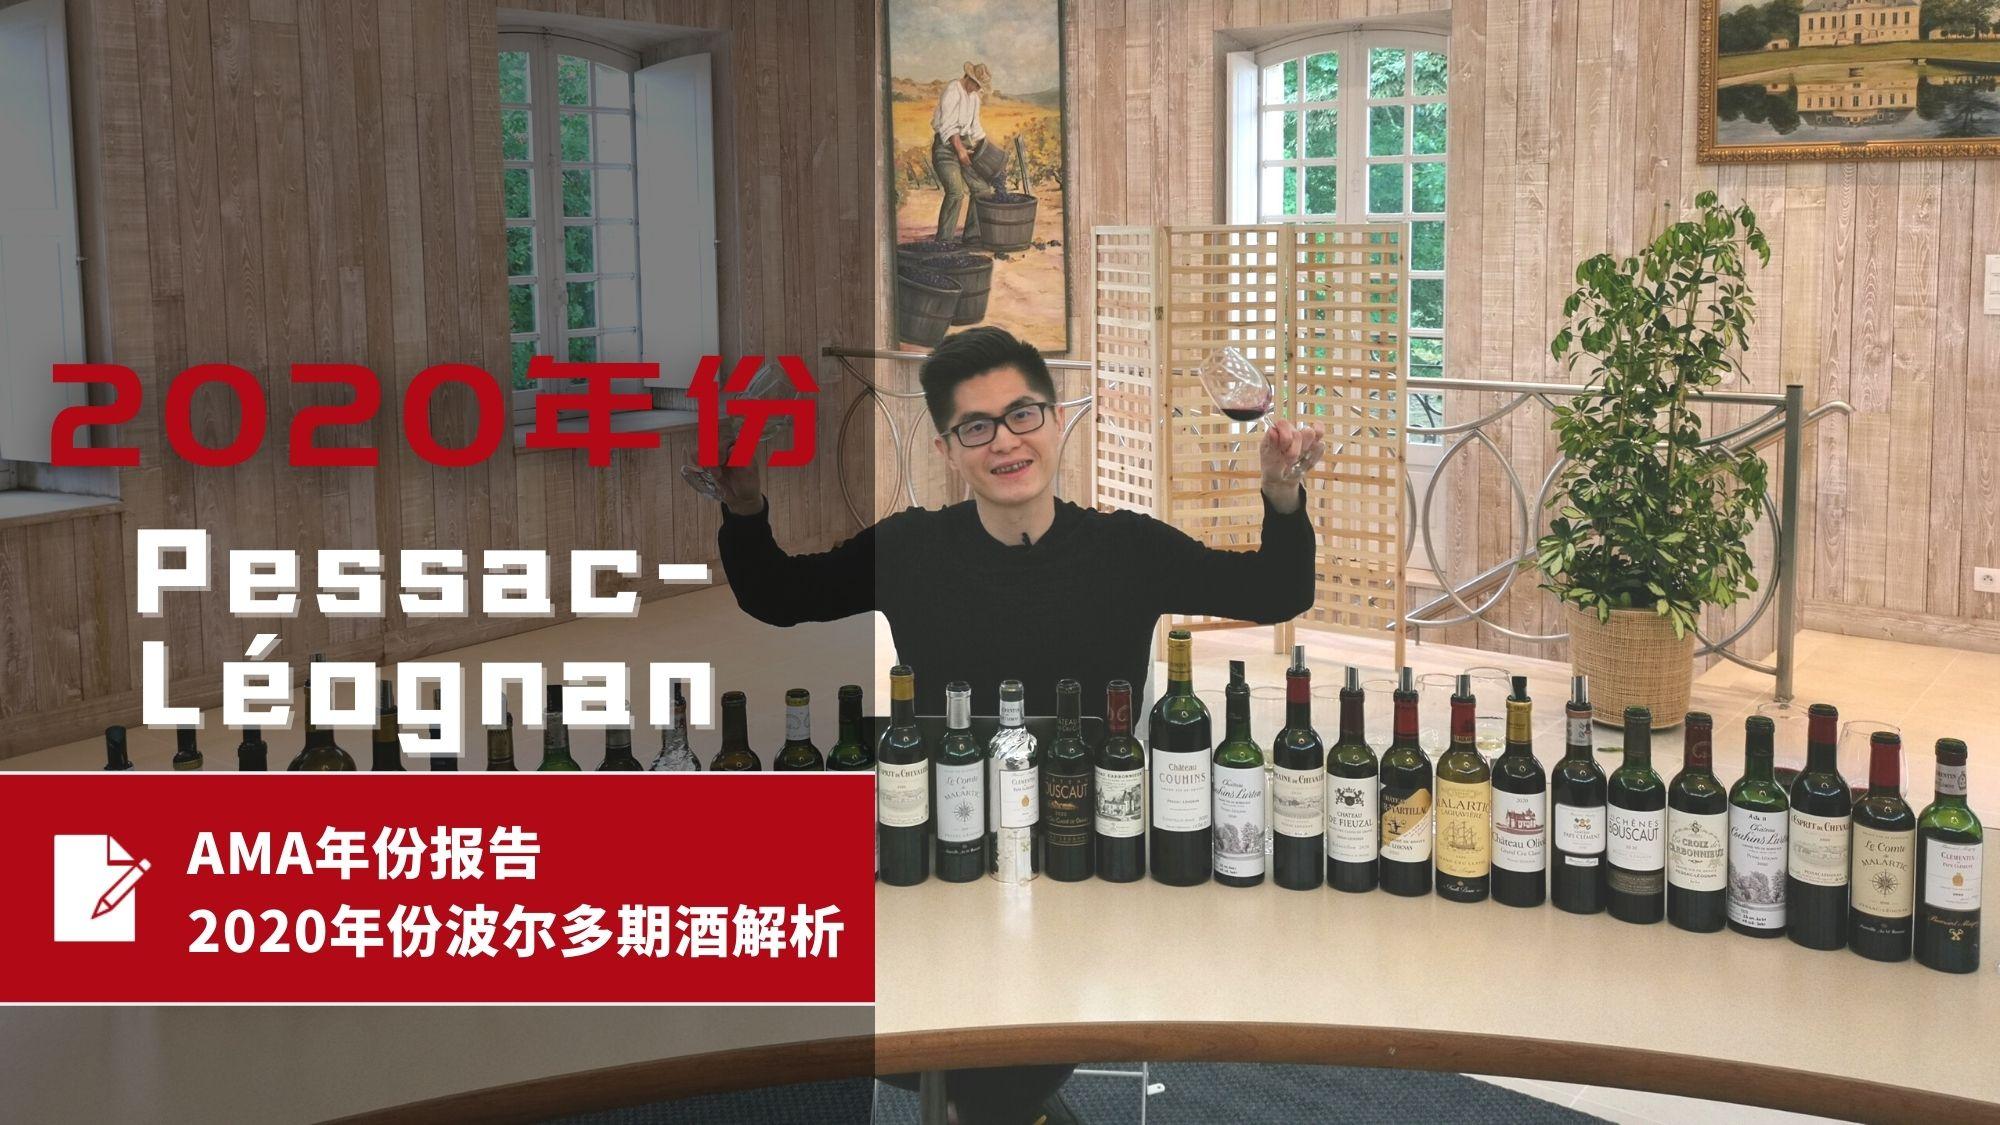 AMA年份报告 – 2020年份波尔多波期酒解析 – Pessac-Léognan 佩萨克-雷奥良 - Alexandre Ma